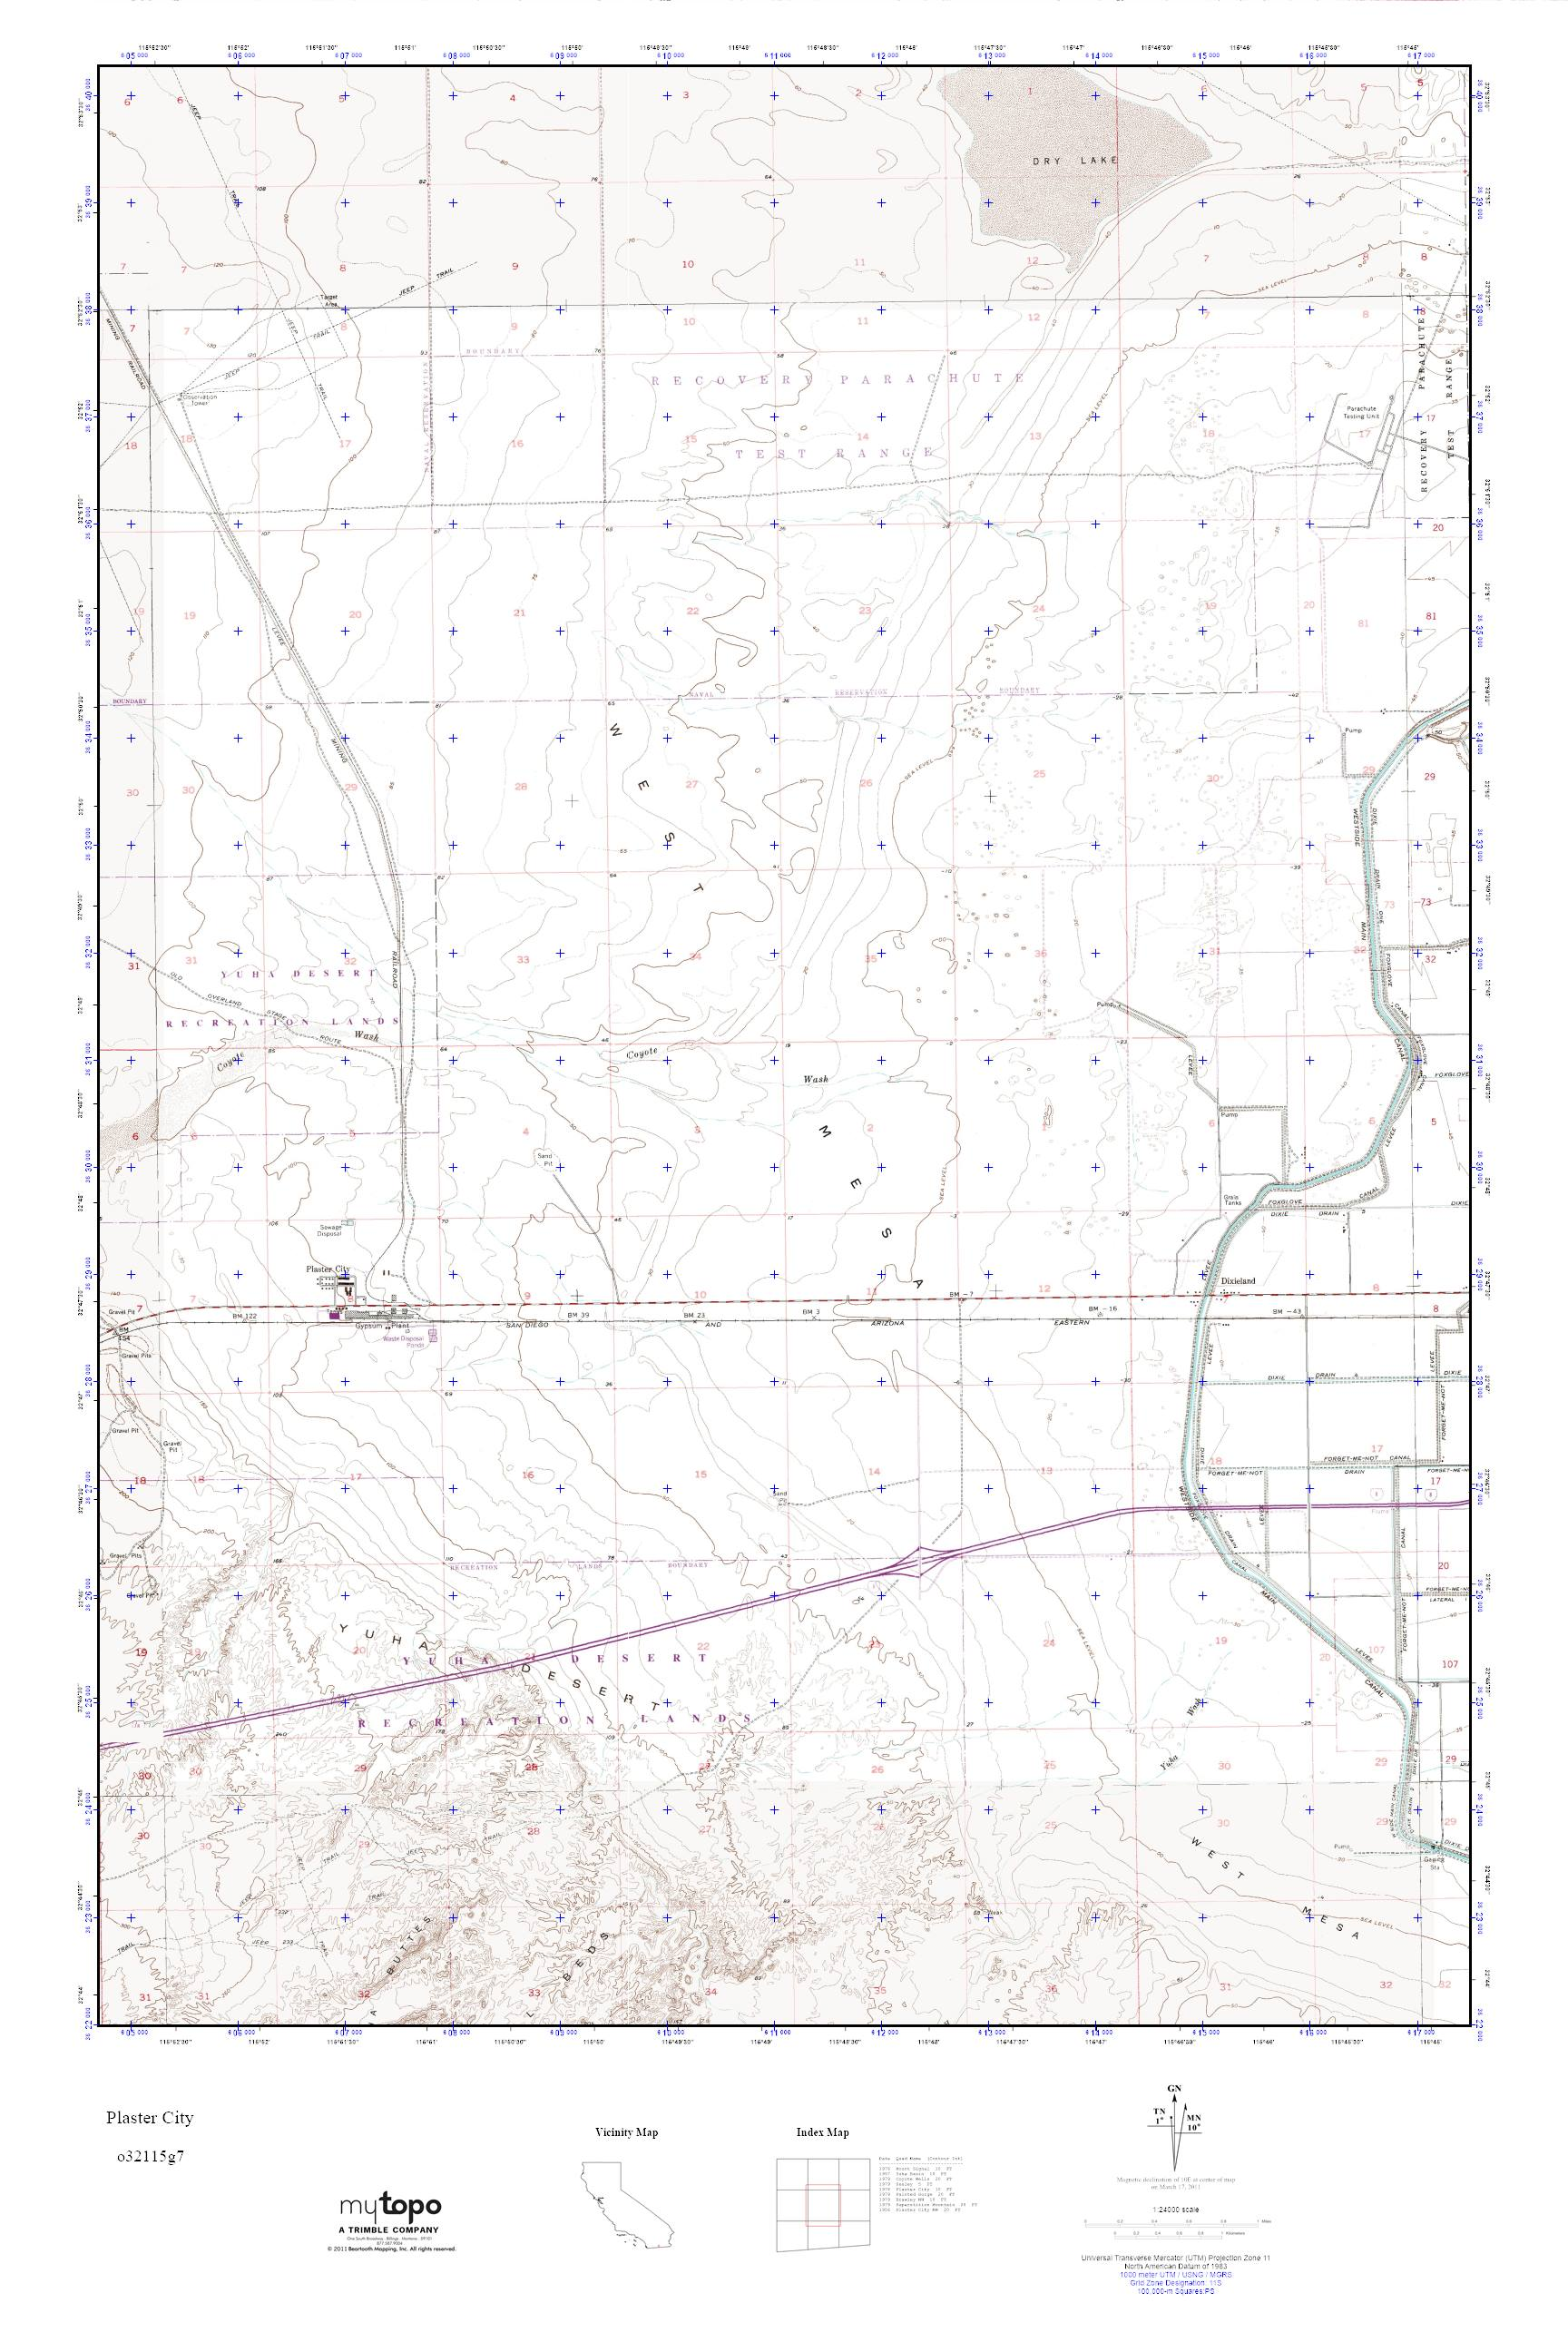 MyTopo Plaster City, California USGS Quad Topo Map